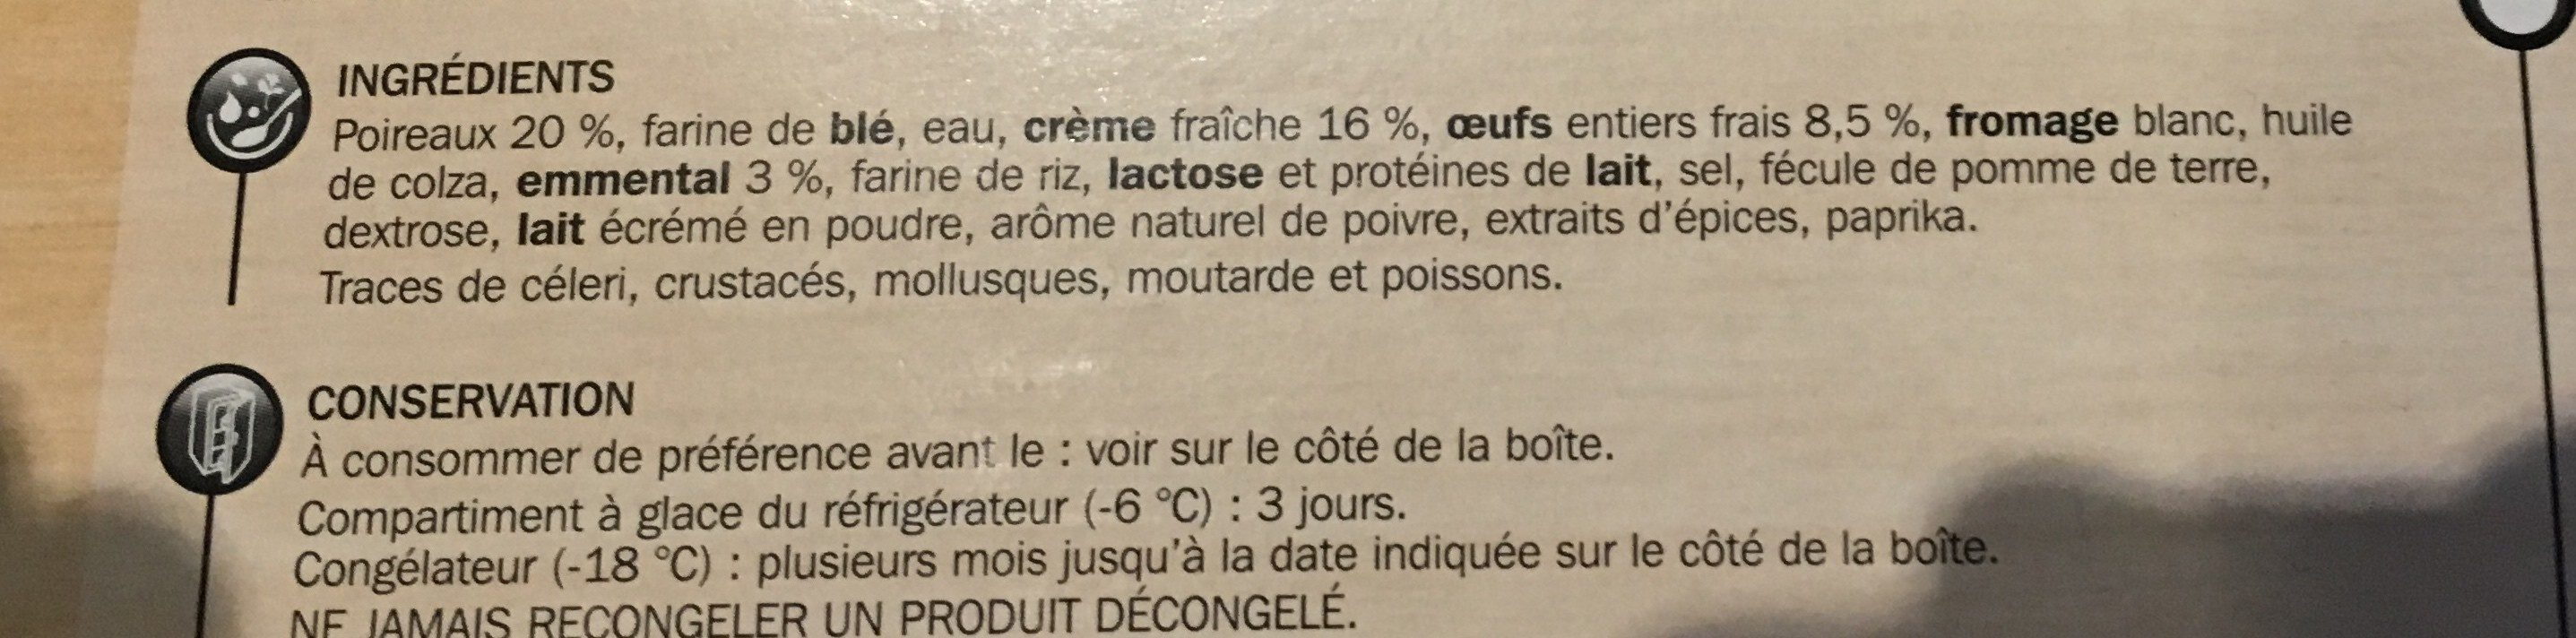 Tarte aux poireaux - Składniki - fr